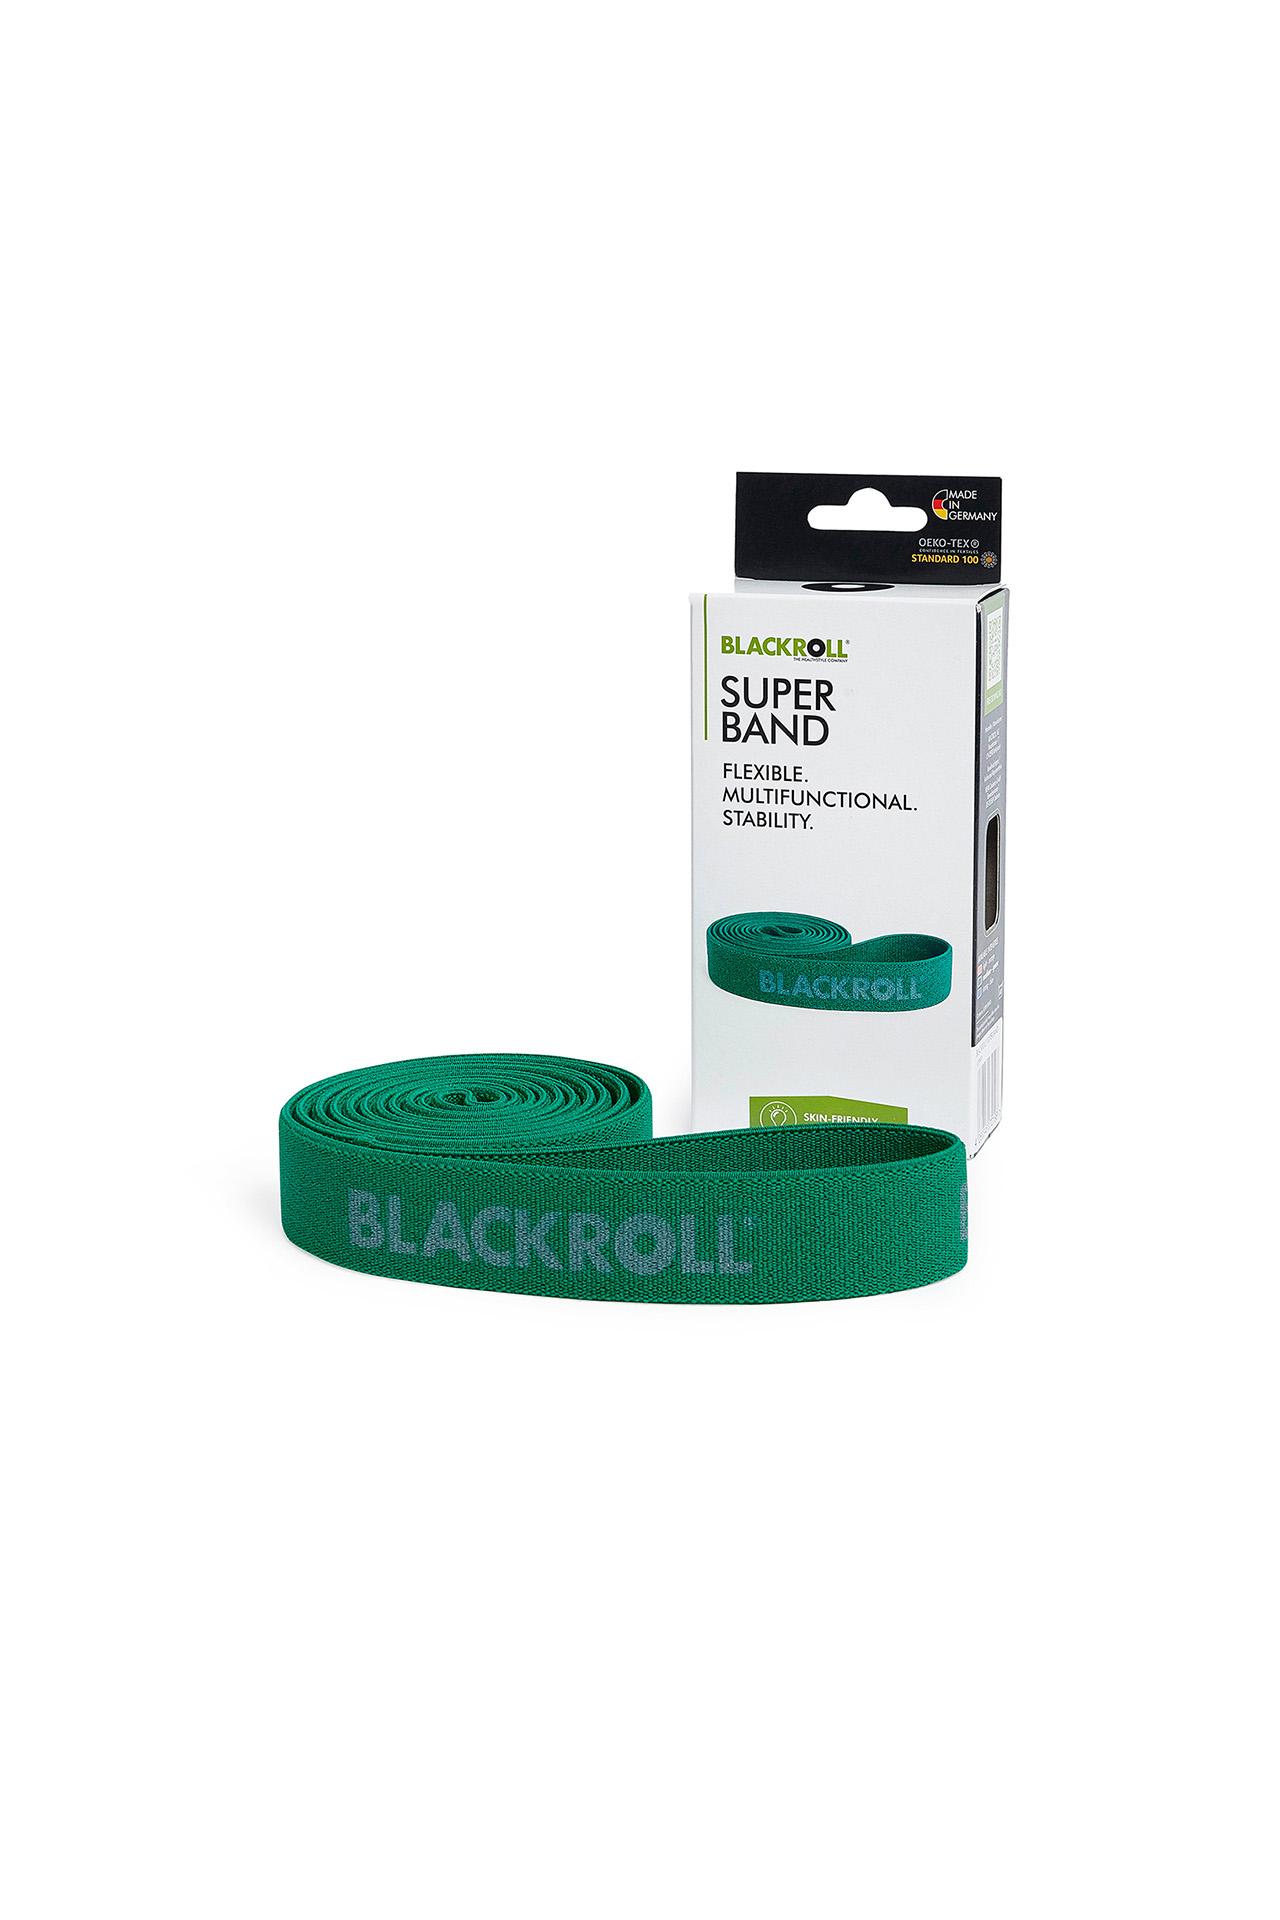 blackroll super band green wien 1080 fengbao shop training